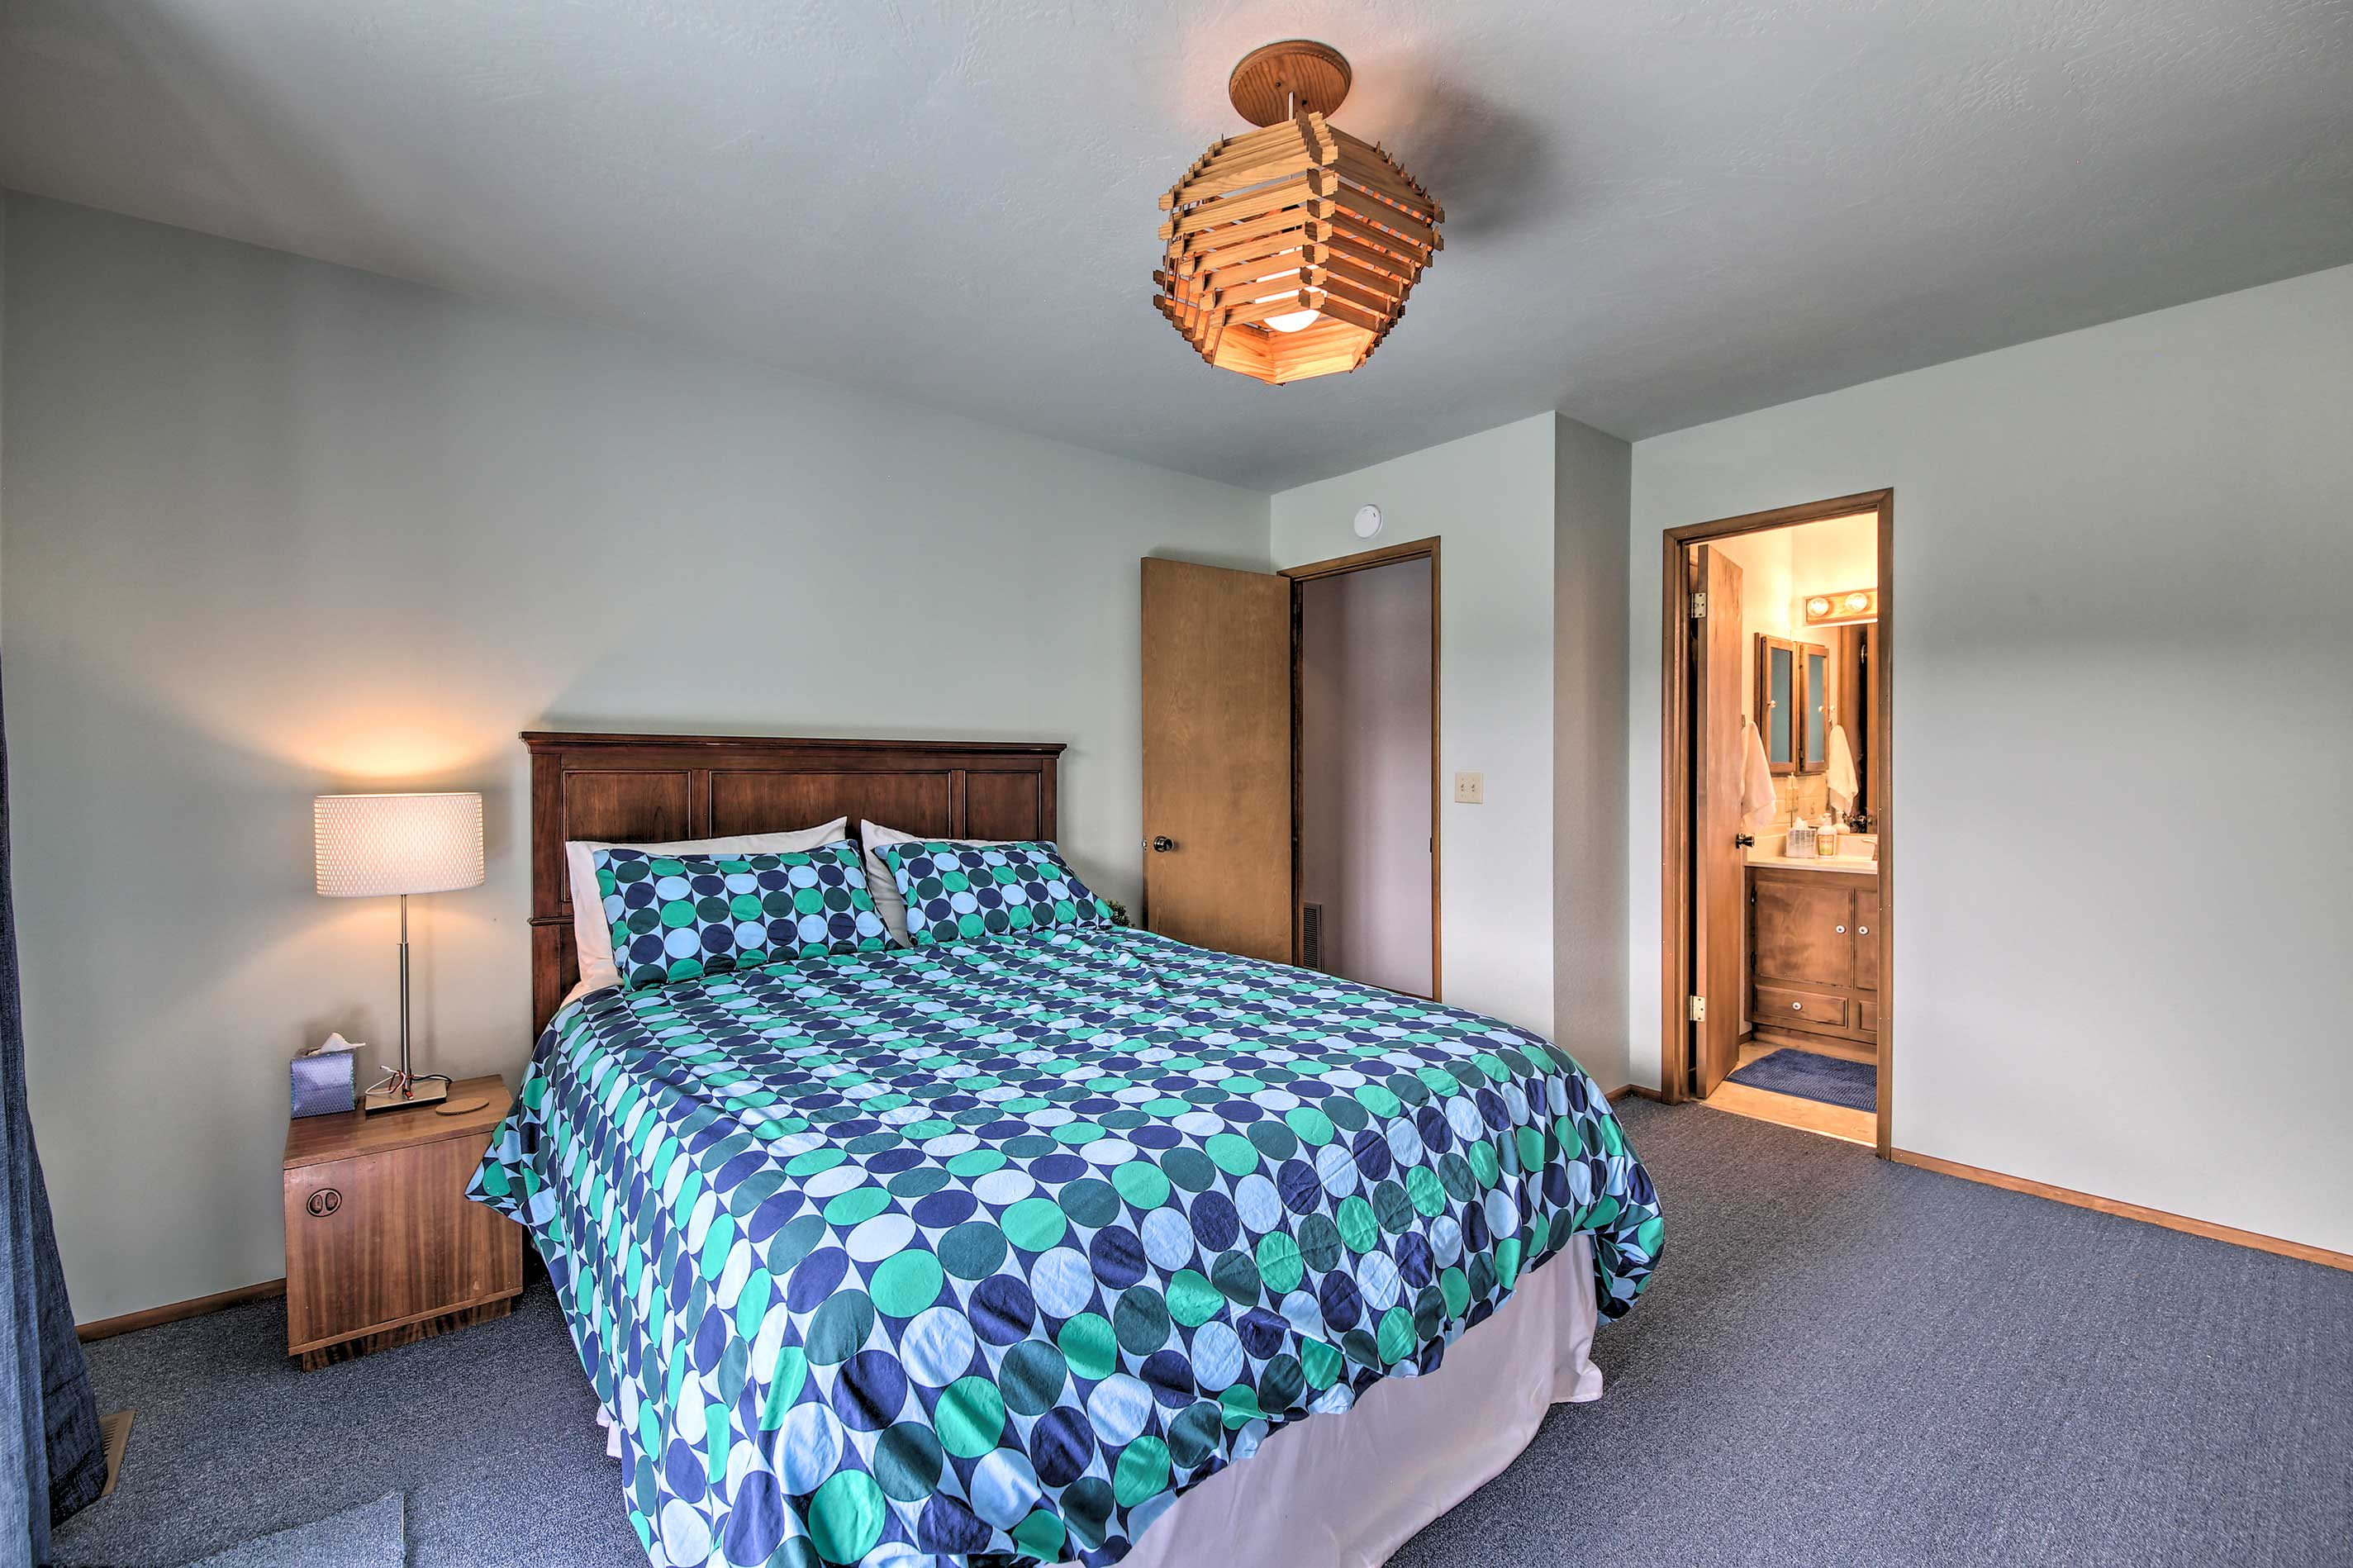 Take advantage of the en-suite bathroom in the master bedroom.